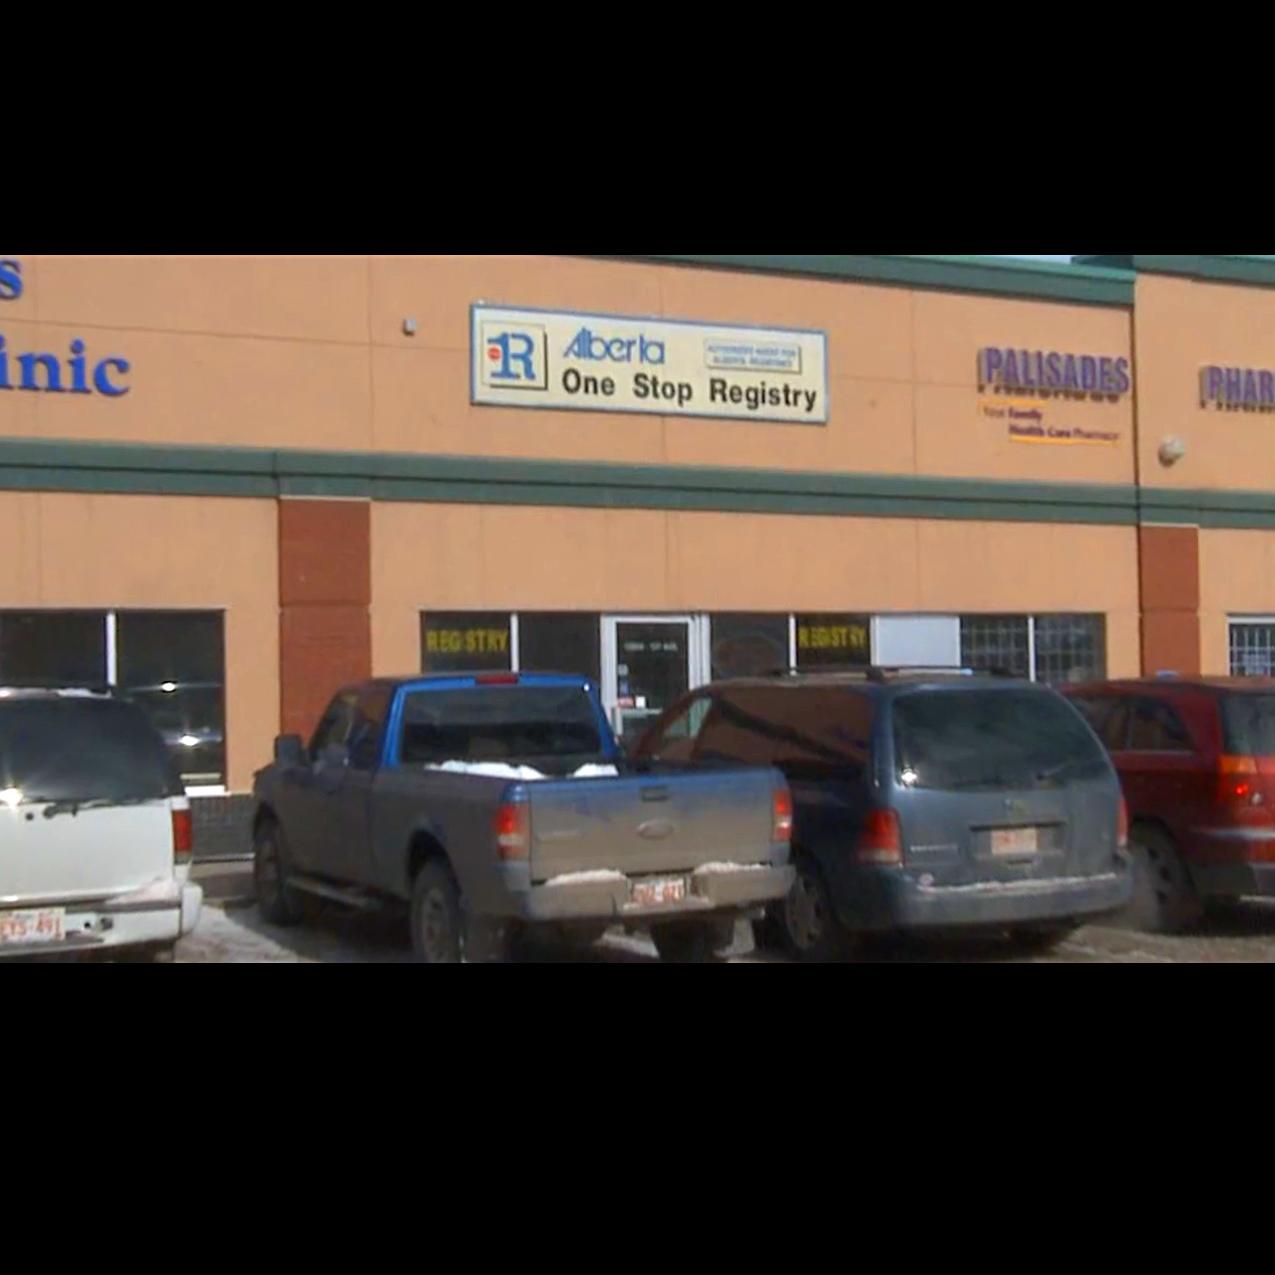 video Alberta One-Stop Registry Ltd